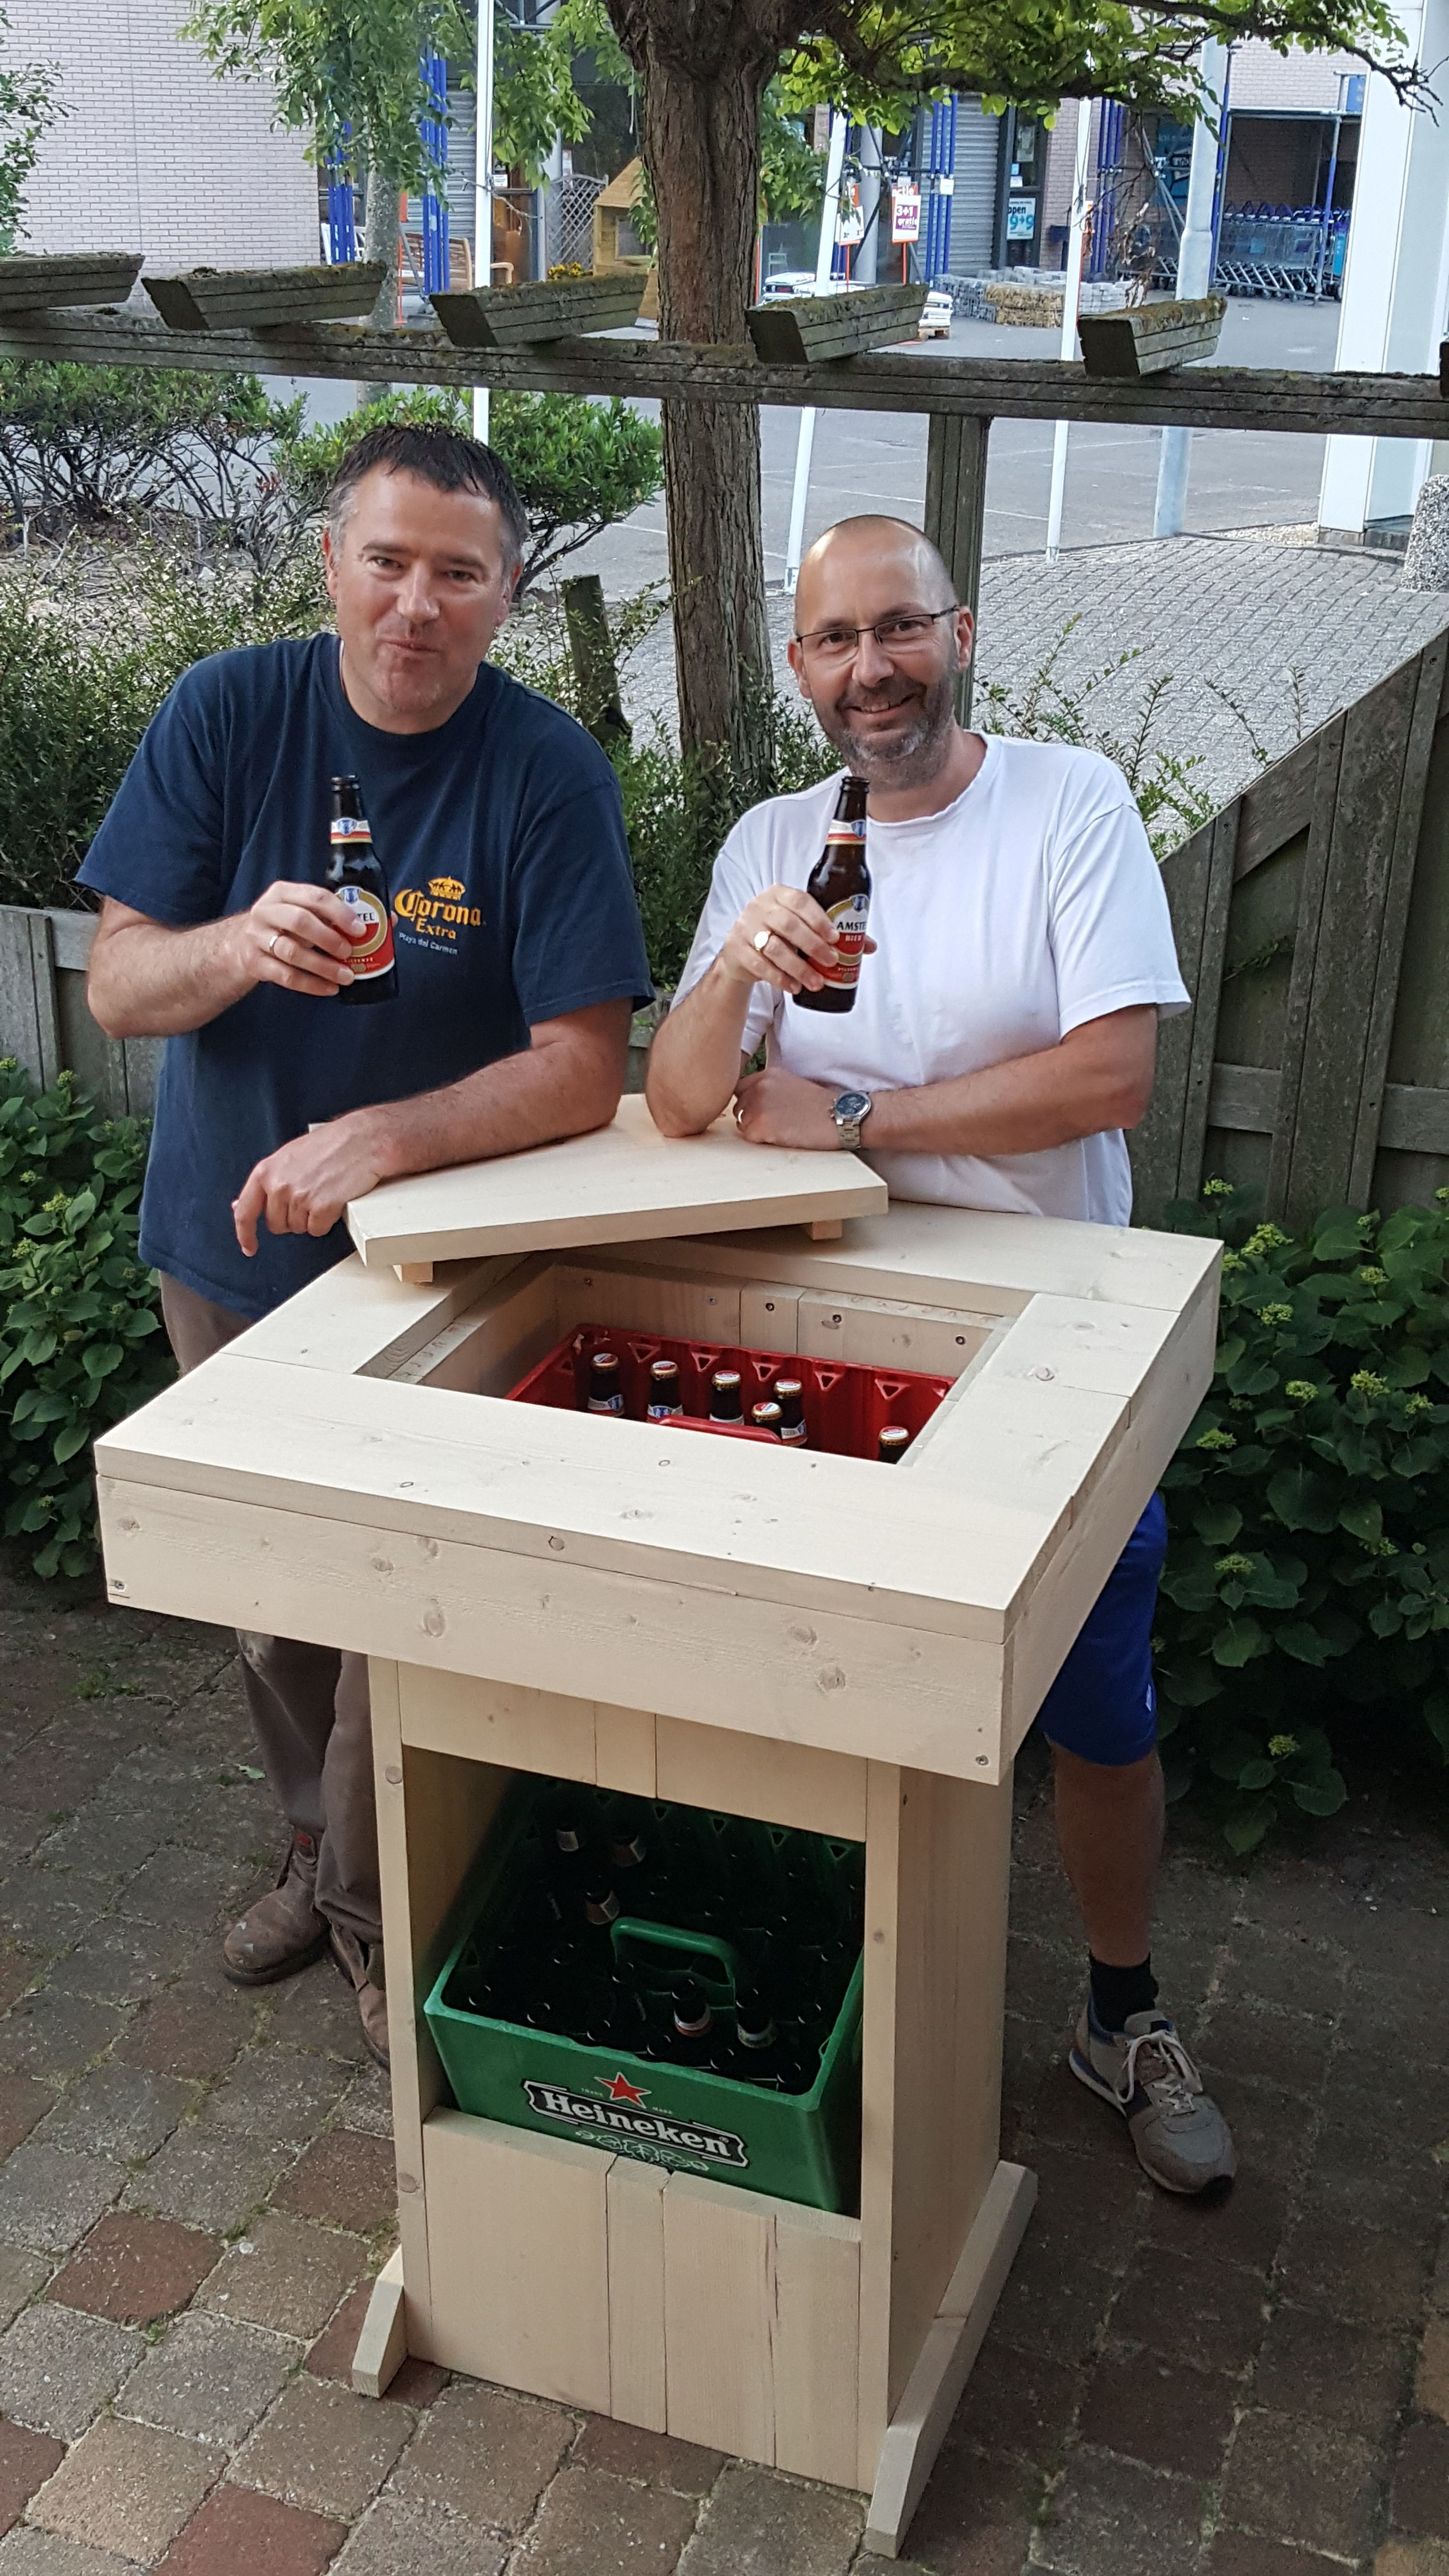 Bouwtekening Statafel Steigerhout.Bier Statafel Bouwtekening In 2019 Wood Chairs Stools And Tables